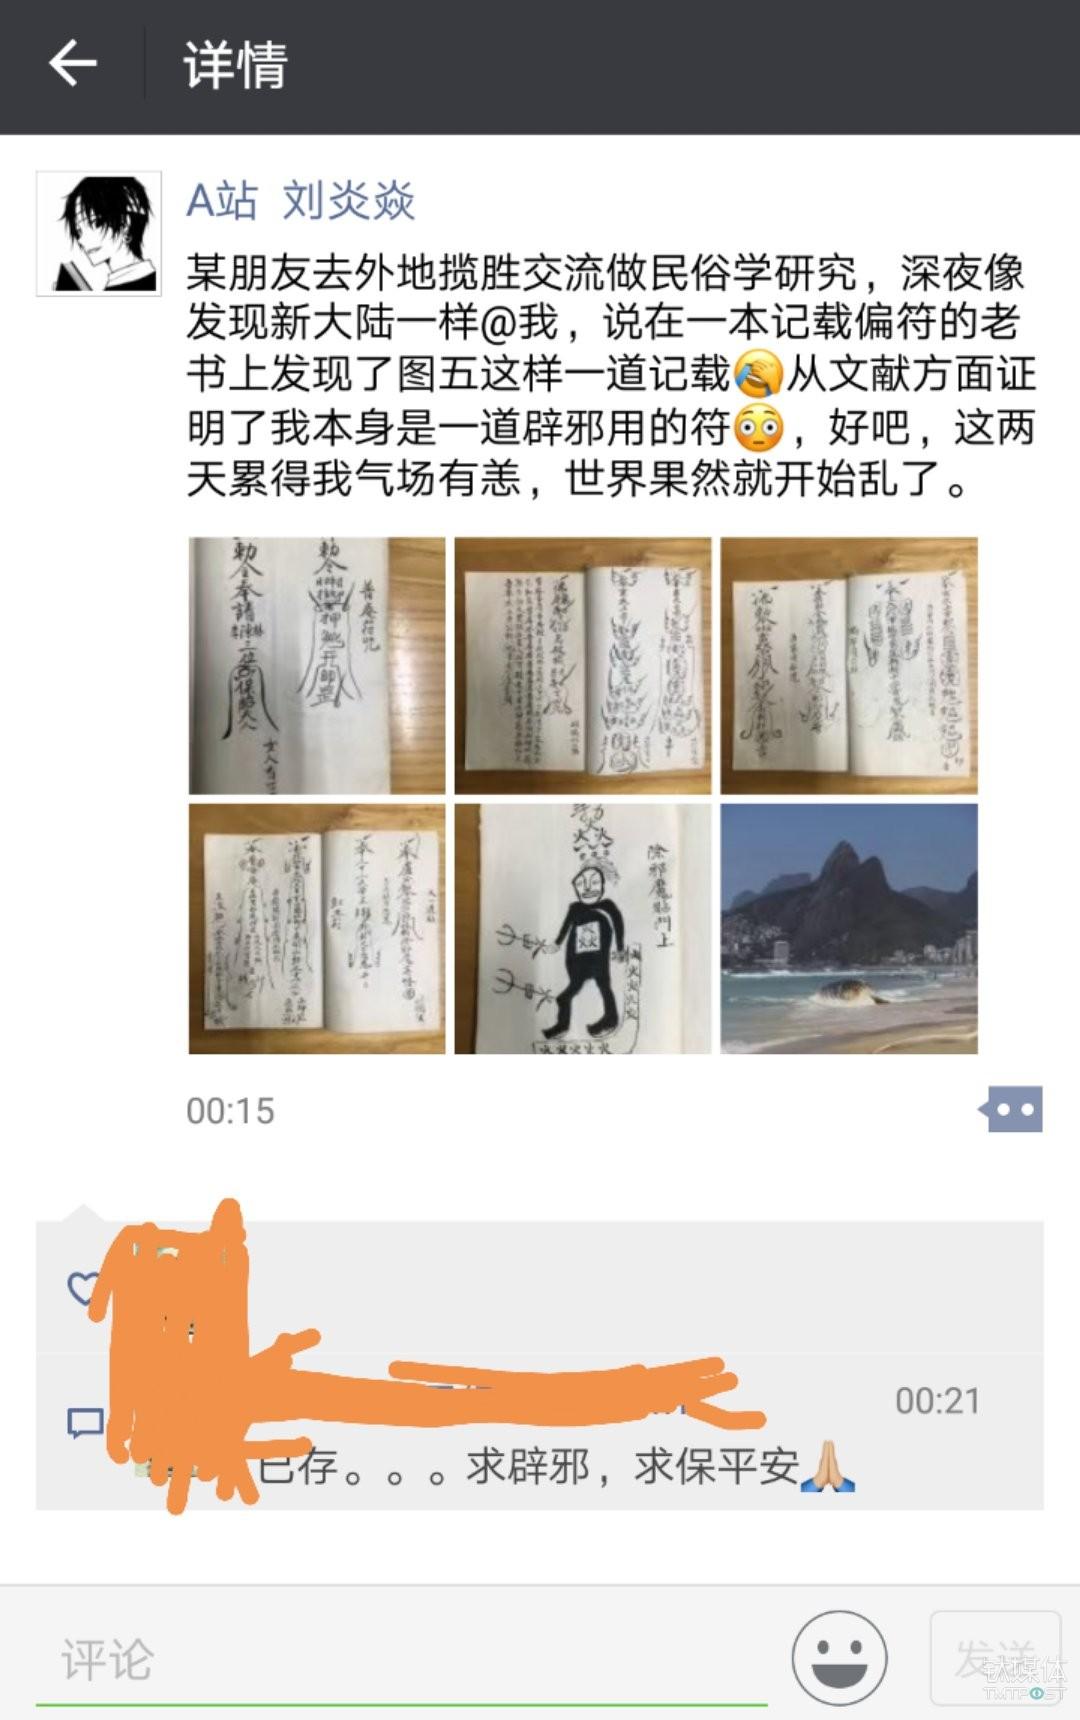 A站CEO 刘焱焱 朋友圈